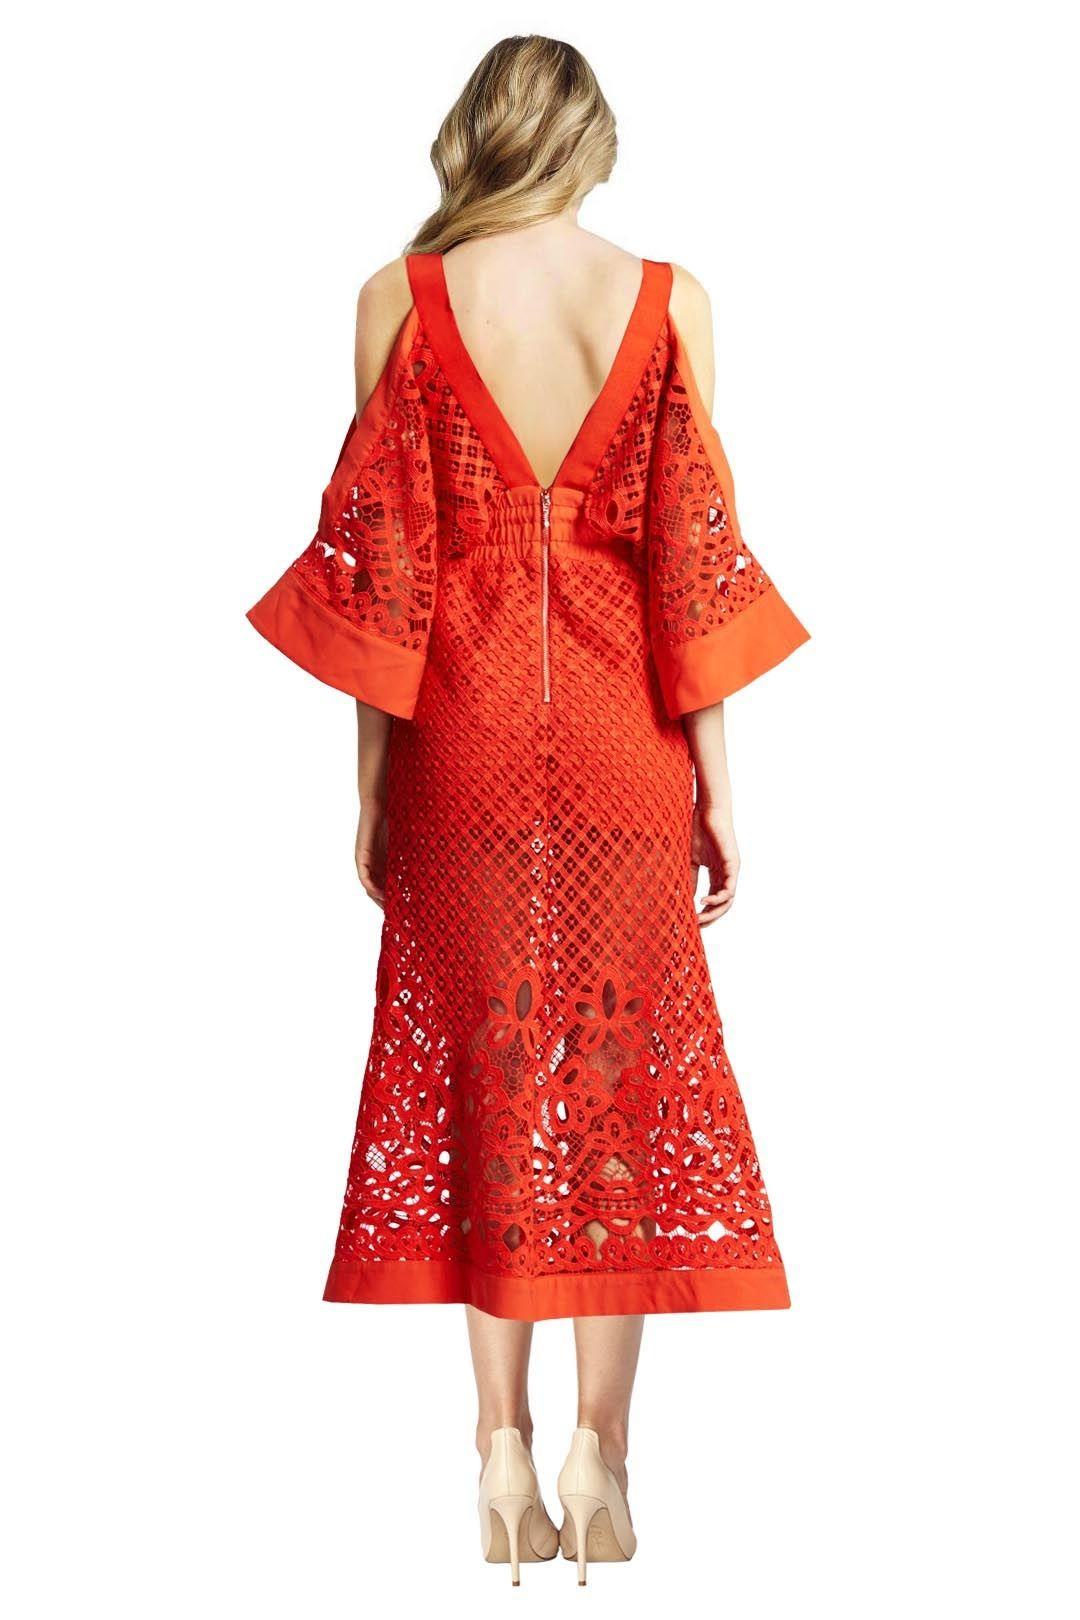 Alice McCall - Break my Love Dress - Red - Back